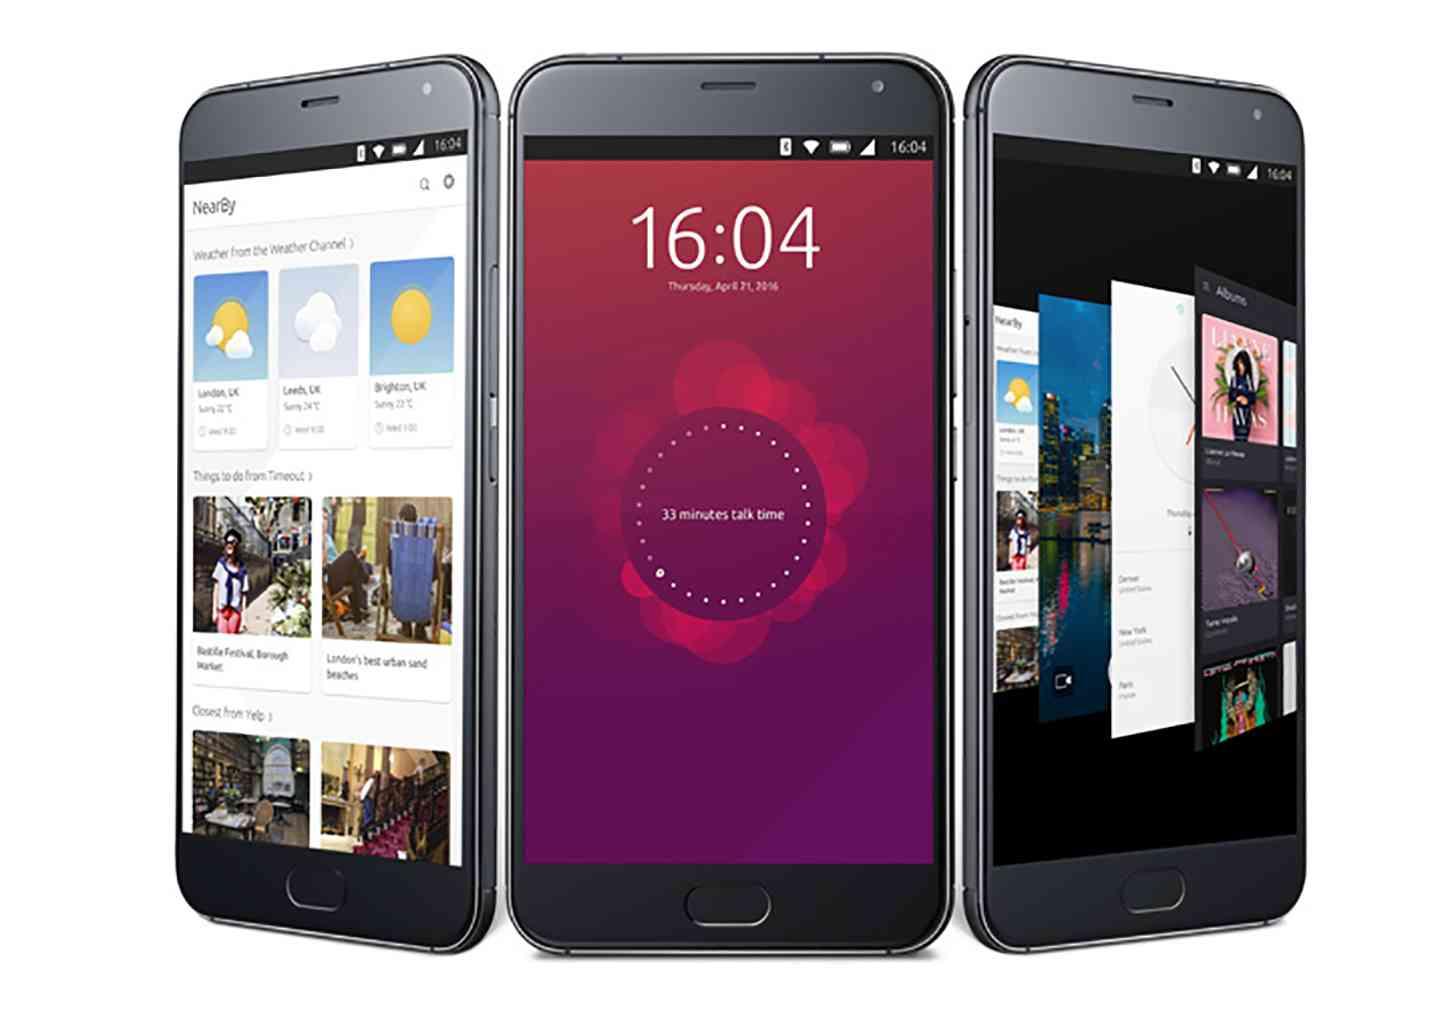 Meizu Pro 5 Ubuntu Edition official